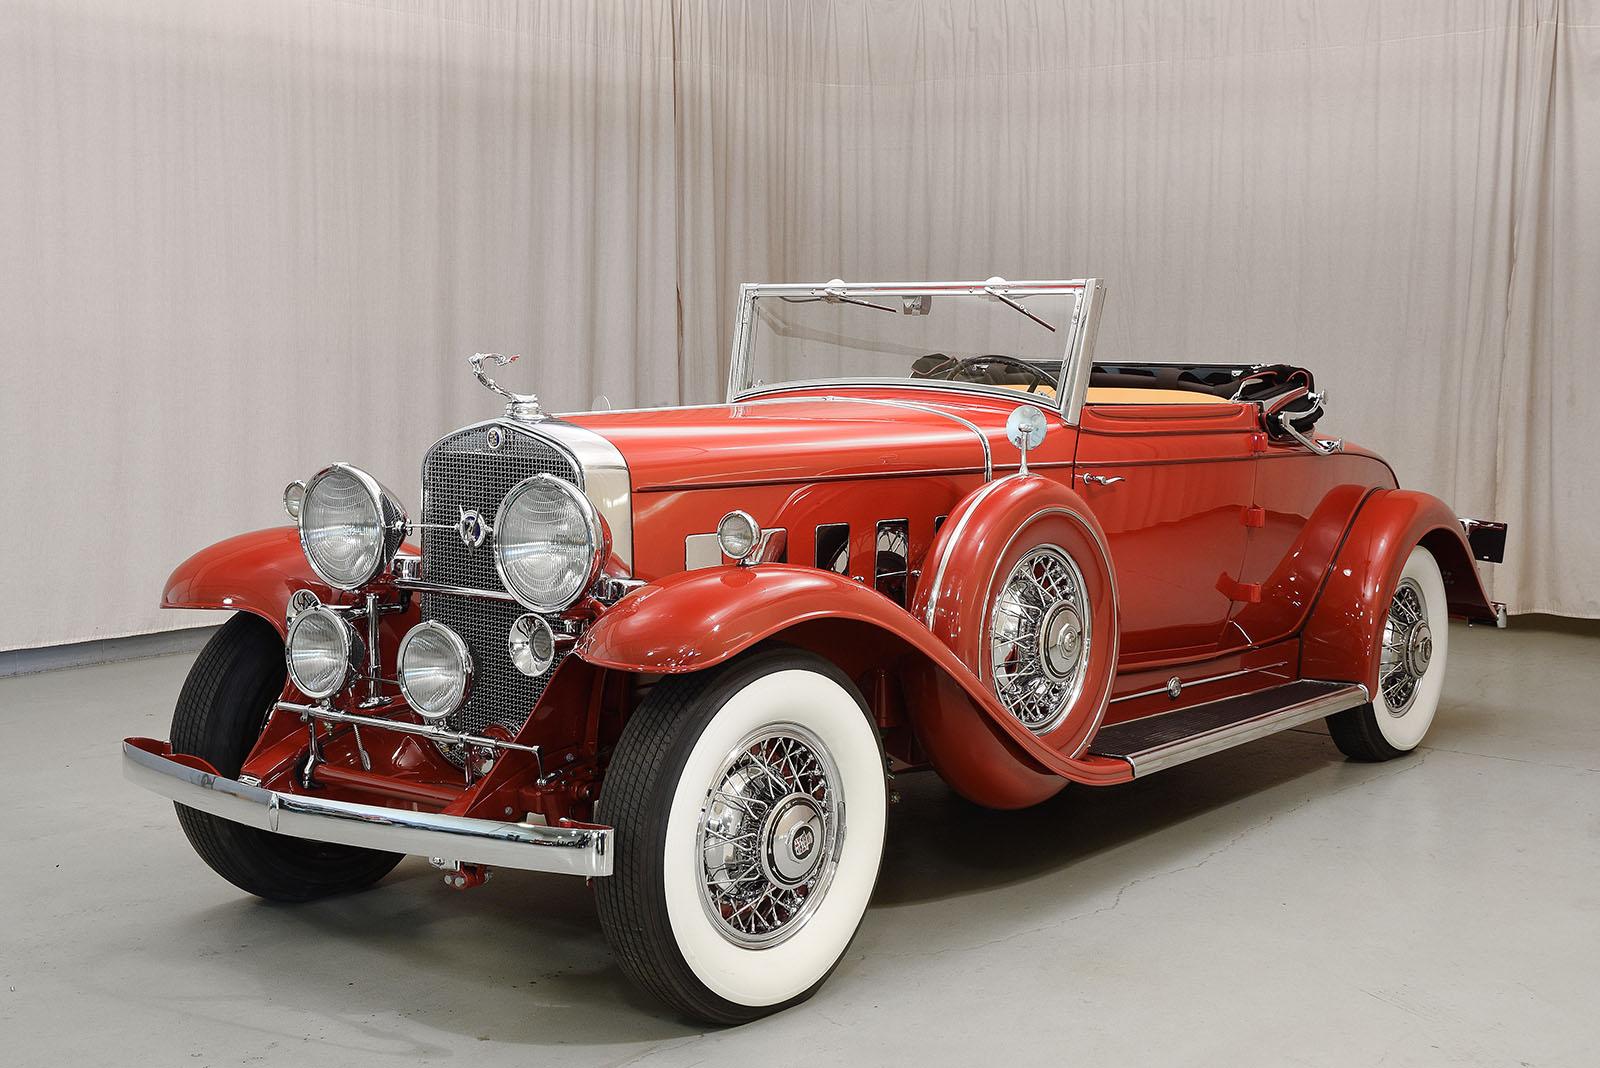 High Resolution Wallpaper | 1931 Cadillac V12 1600x1068 px